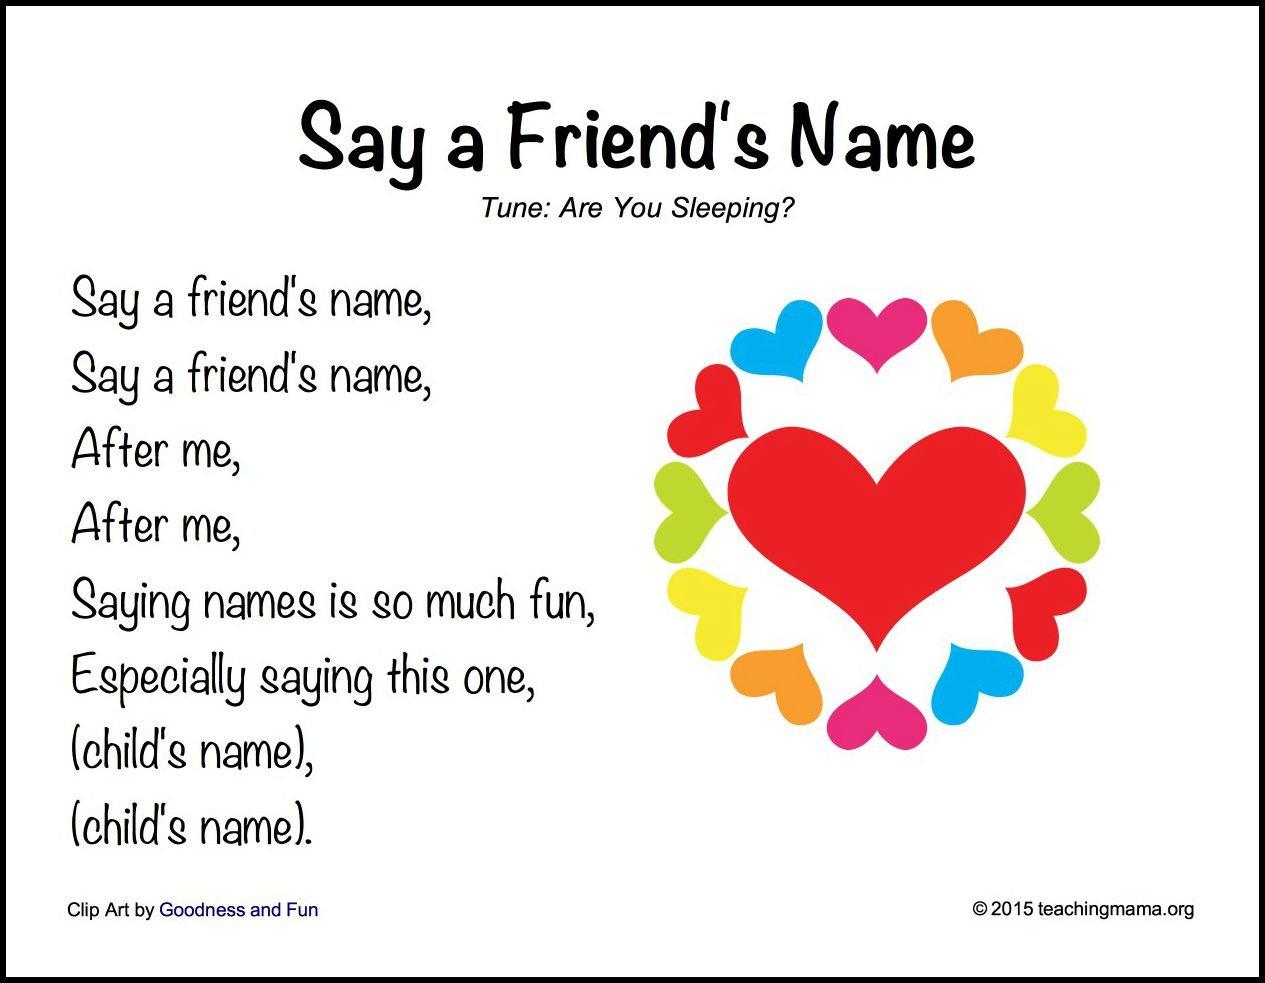 Say a Friend's Name